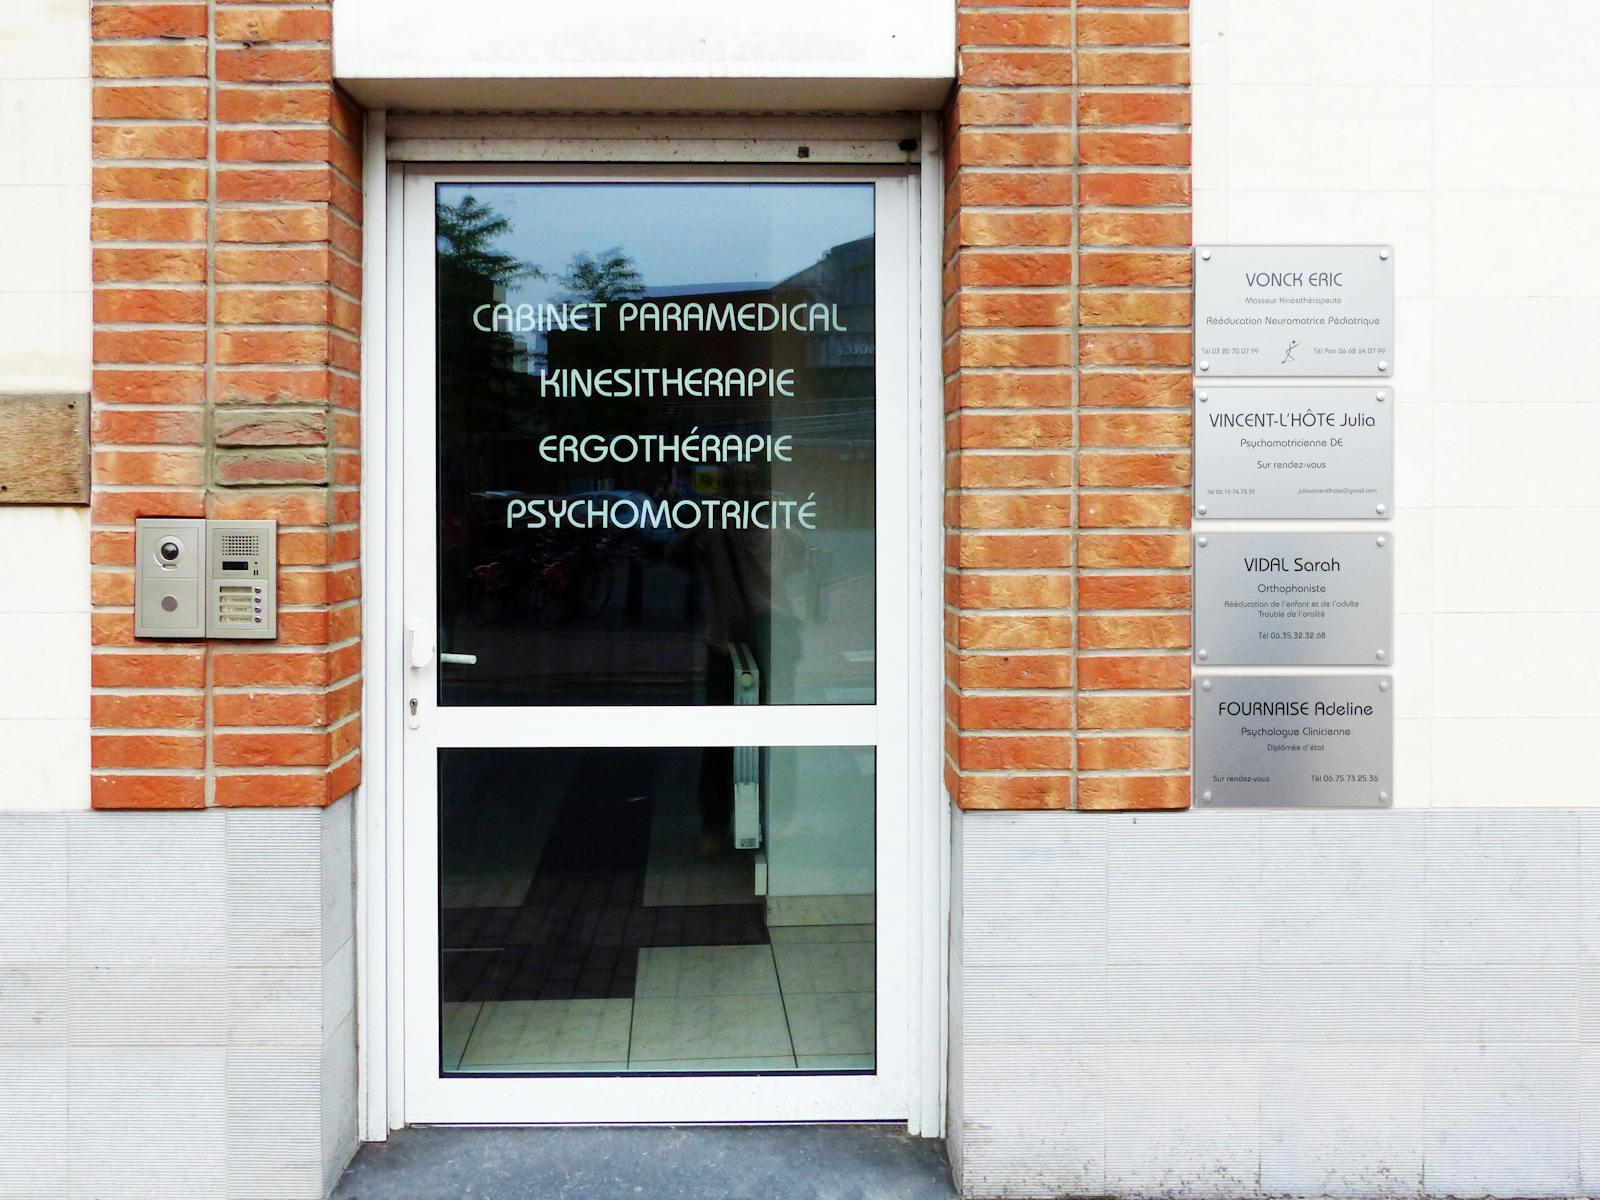 Cabinet Paramédical Tourcoing Centre - Rue des Anges.